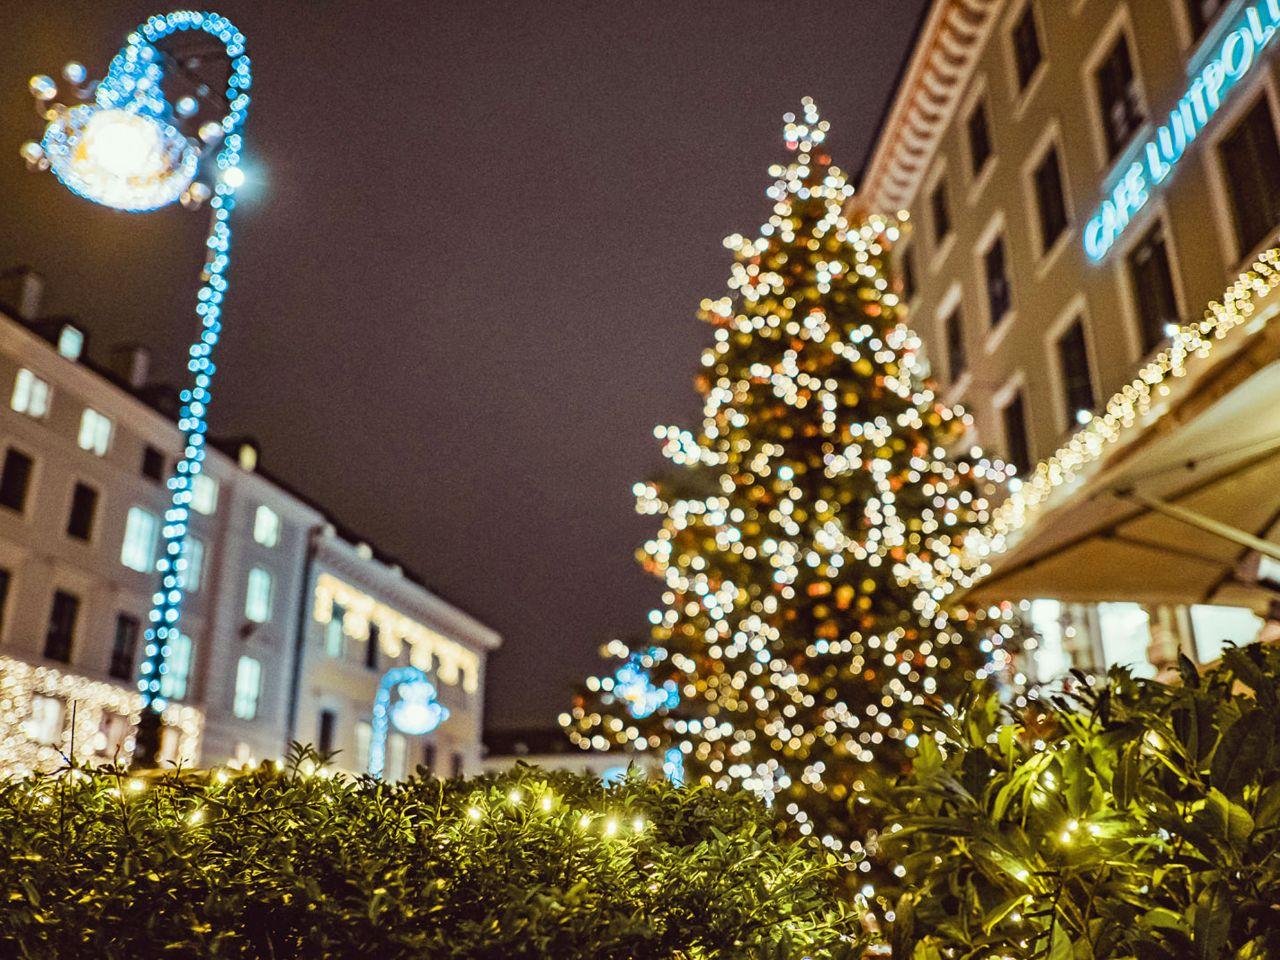 aa684eb3b788a0 Weihnachten in München - Das offizielle Stadtportal muenchen.de